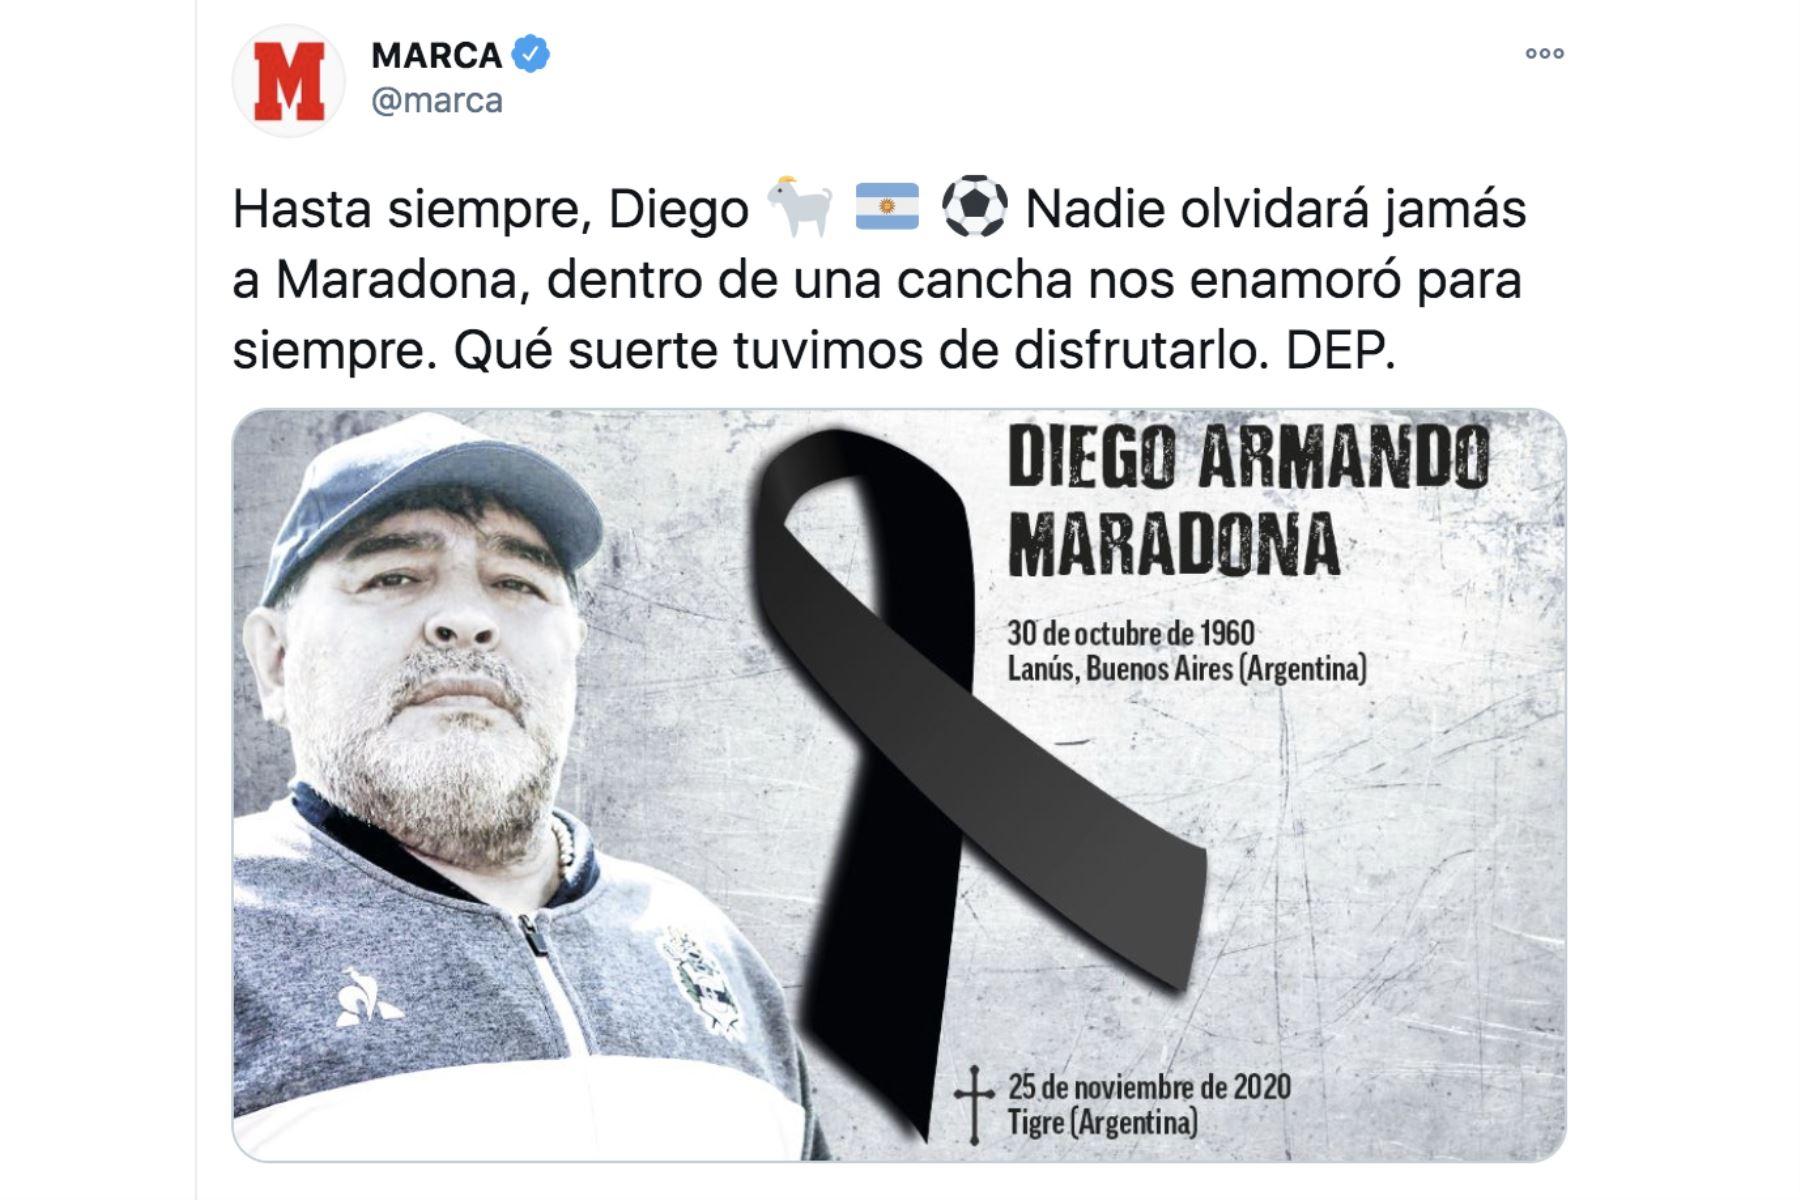 Así informa la prensa mundial la muerte de Diego Armando Maradona. Marca.